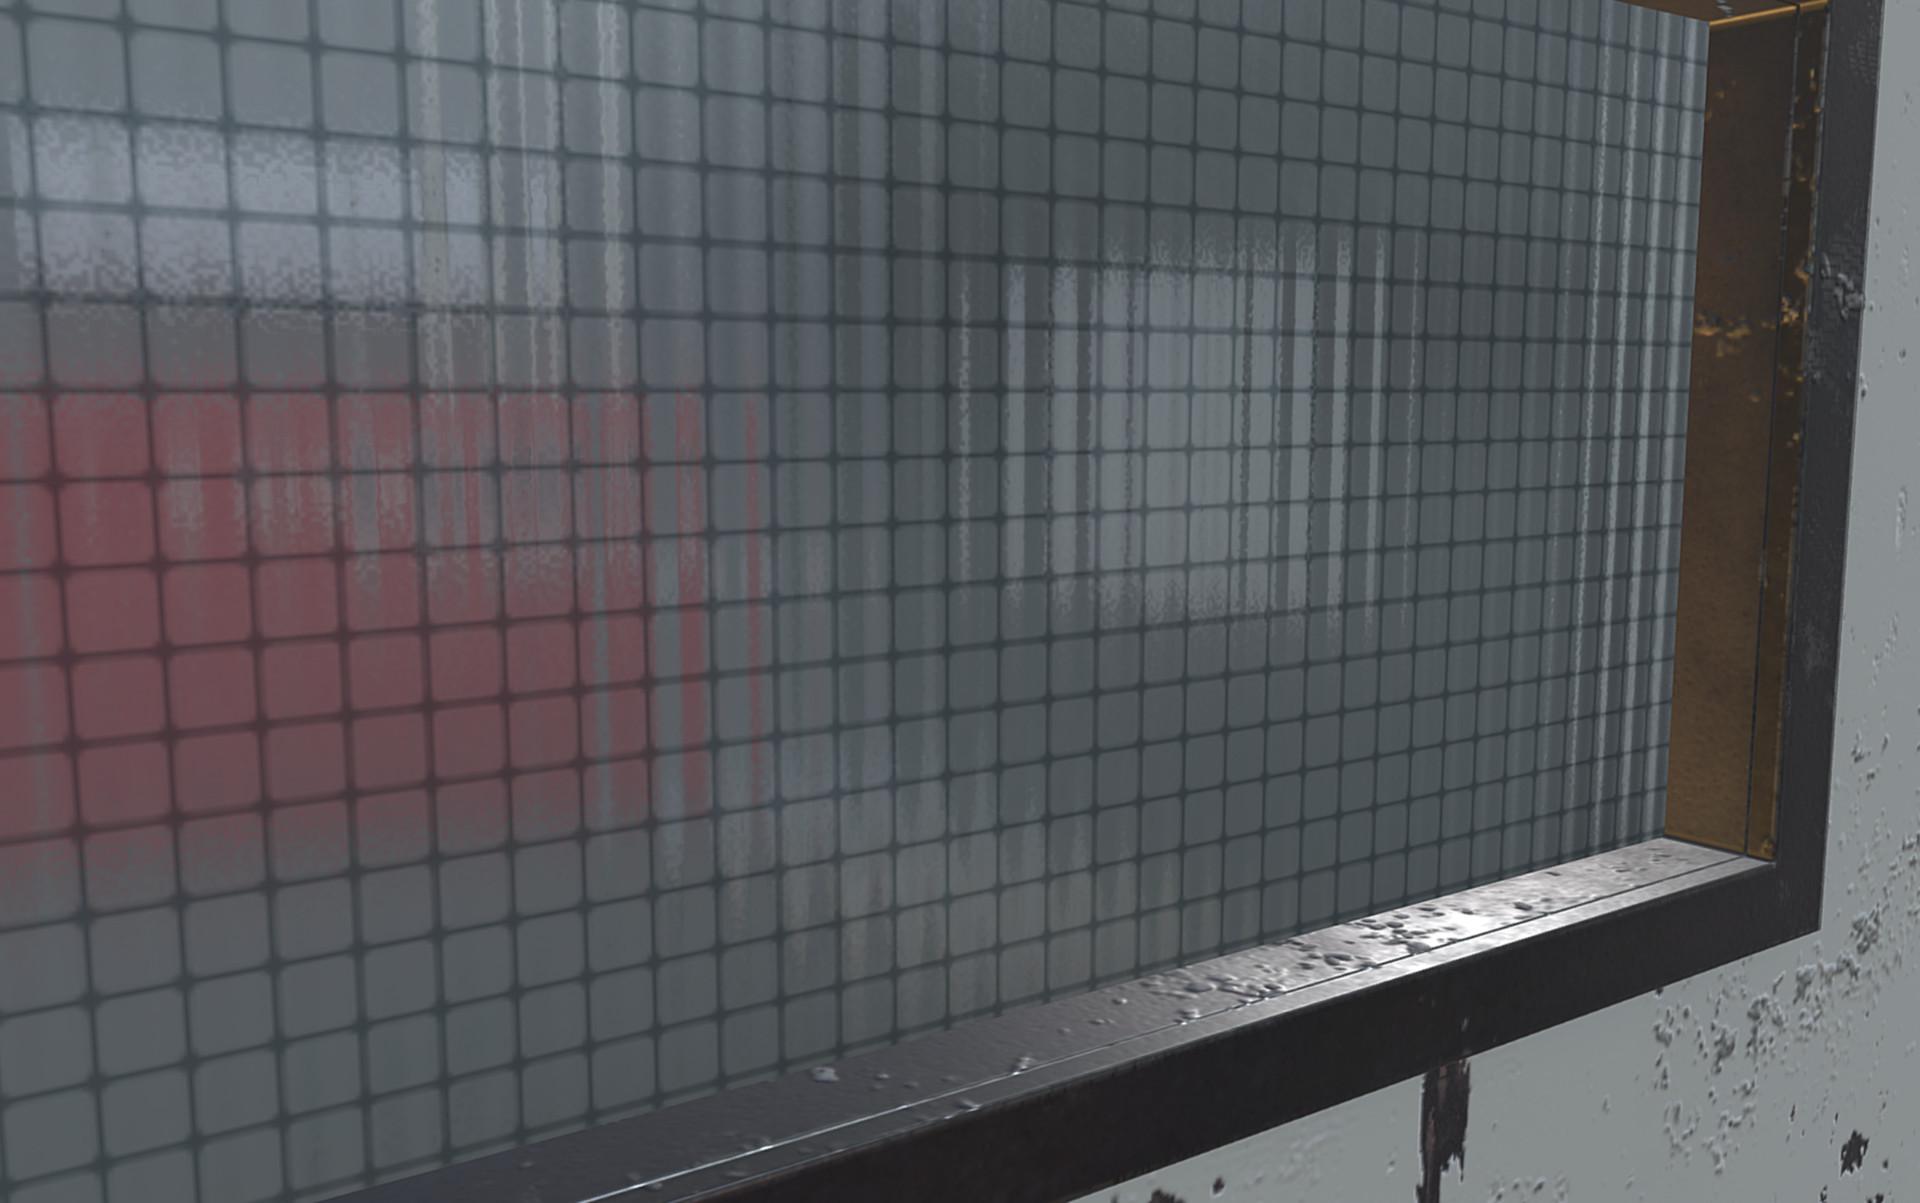 Jail Cell Asset Pack - reinforced glass material detail